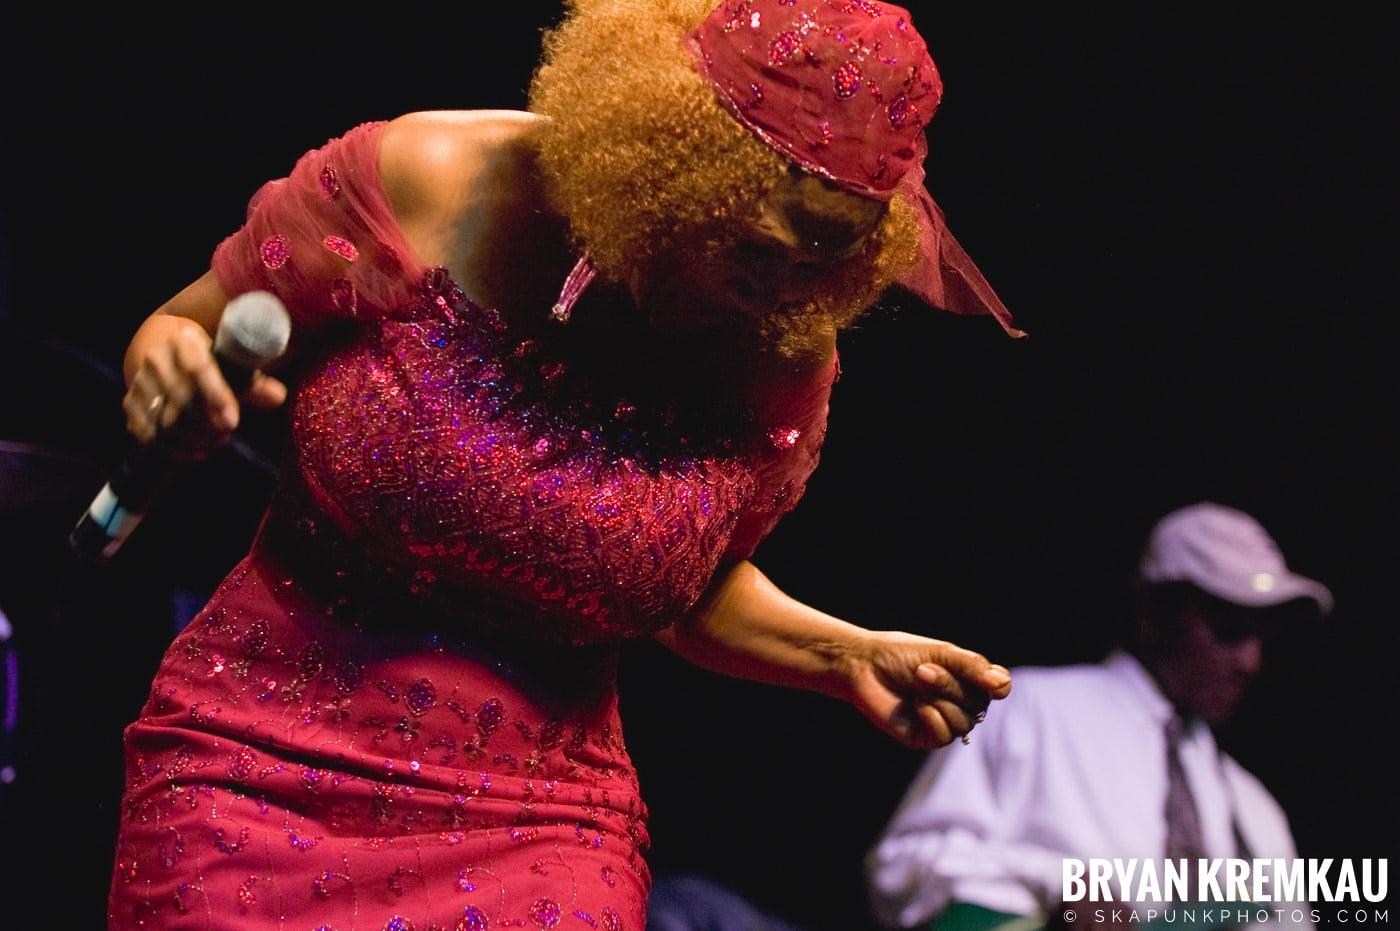 Marcia Griffiths @ Vintage Reggae Fest - Hammerstein Ballroom, NYC - 12.16.2007 (3)